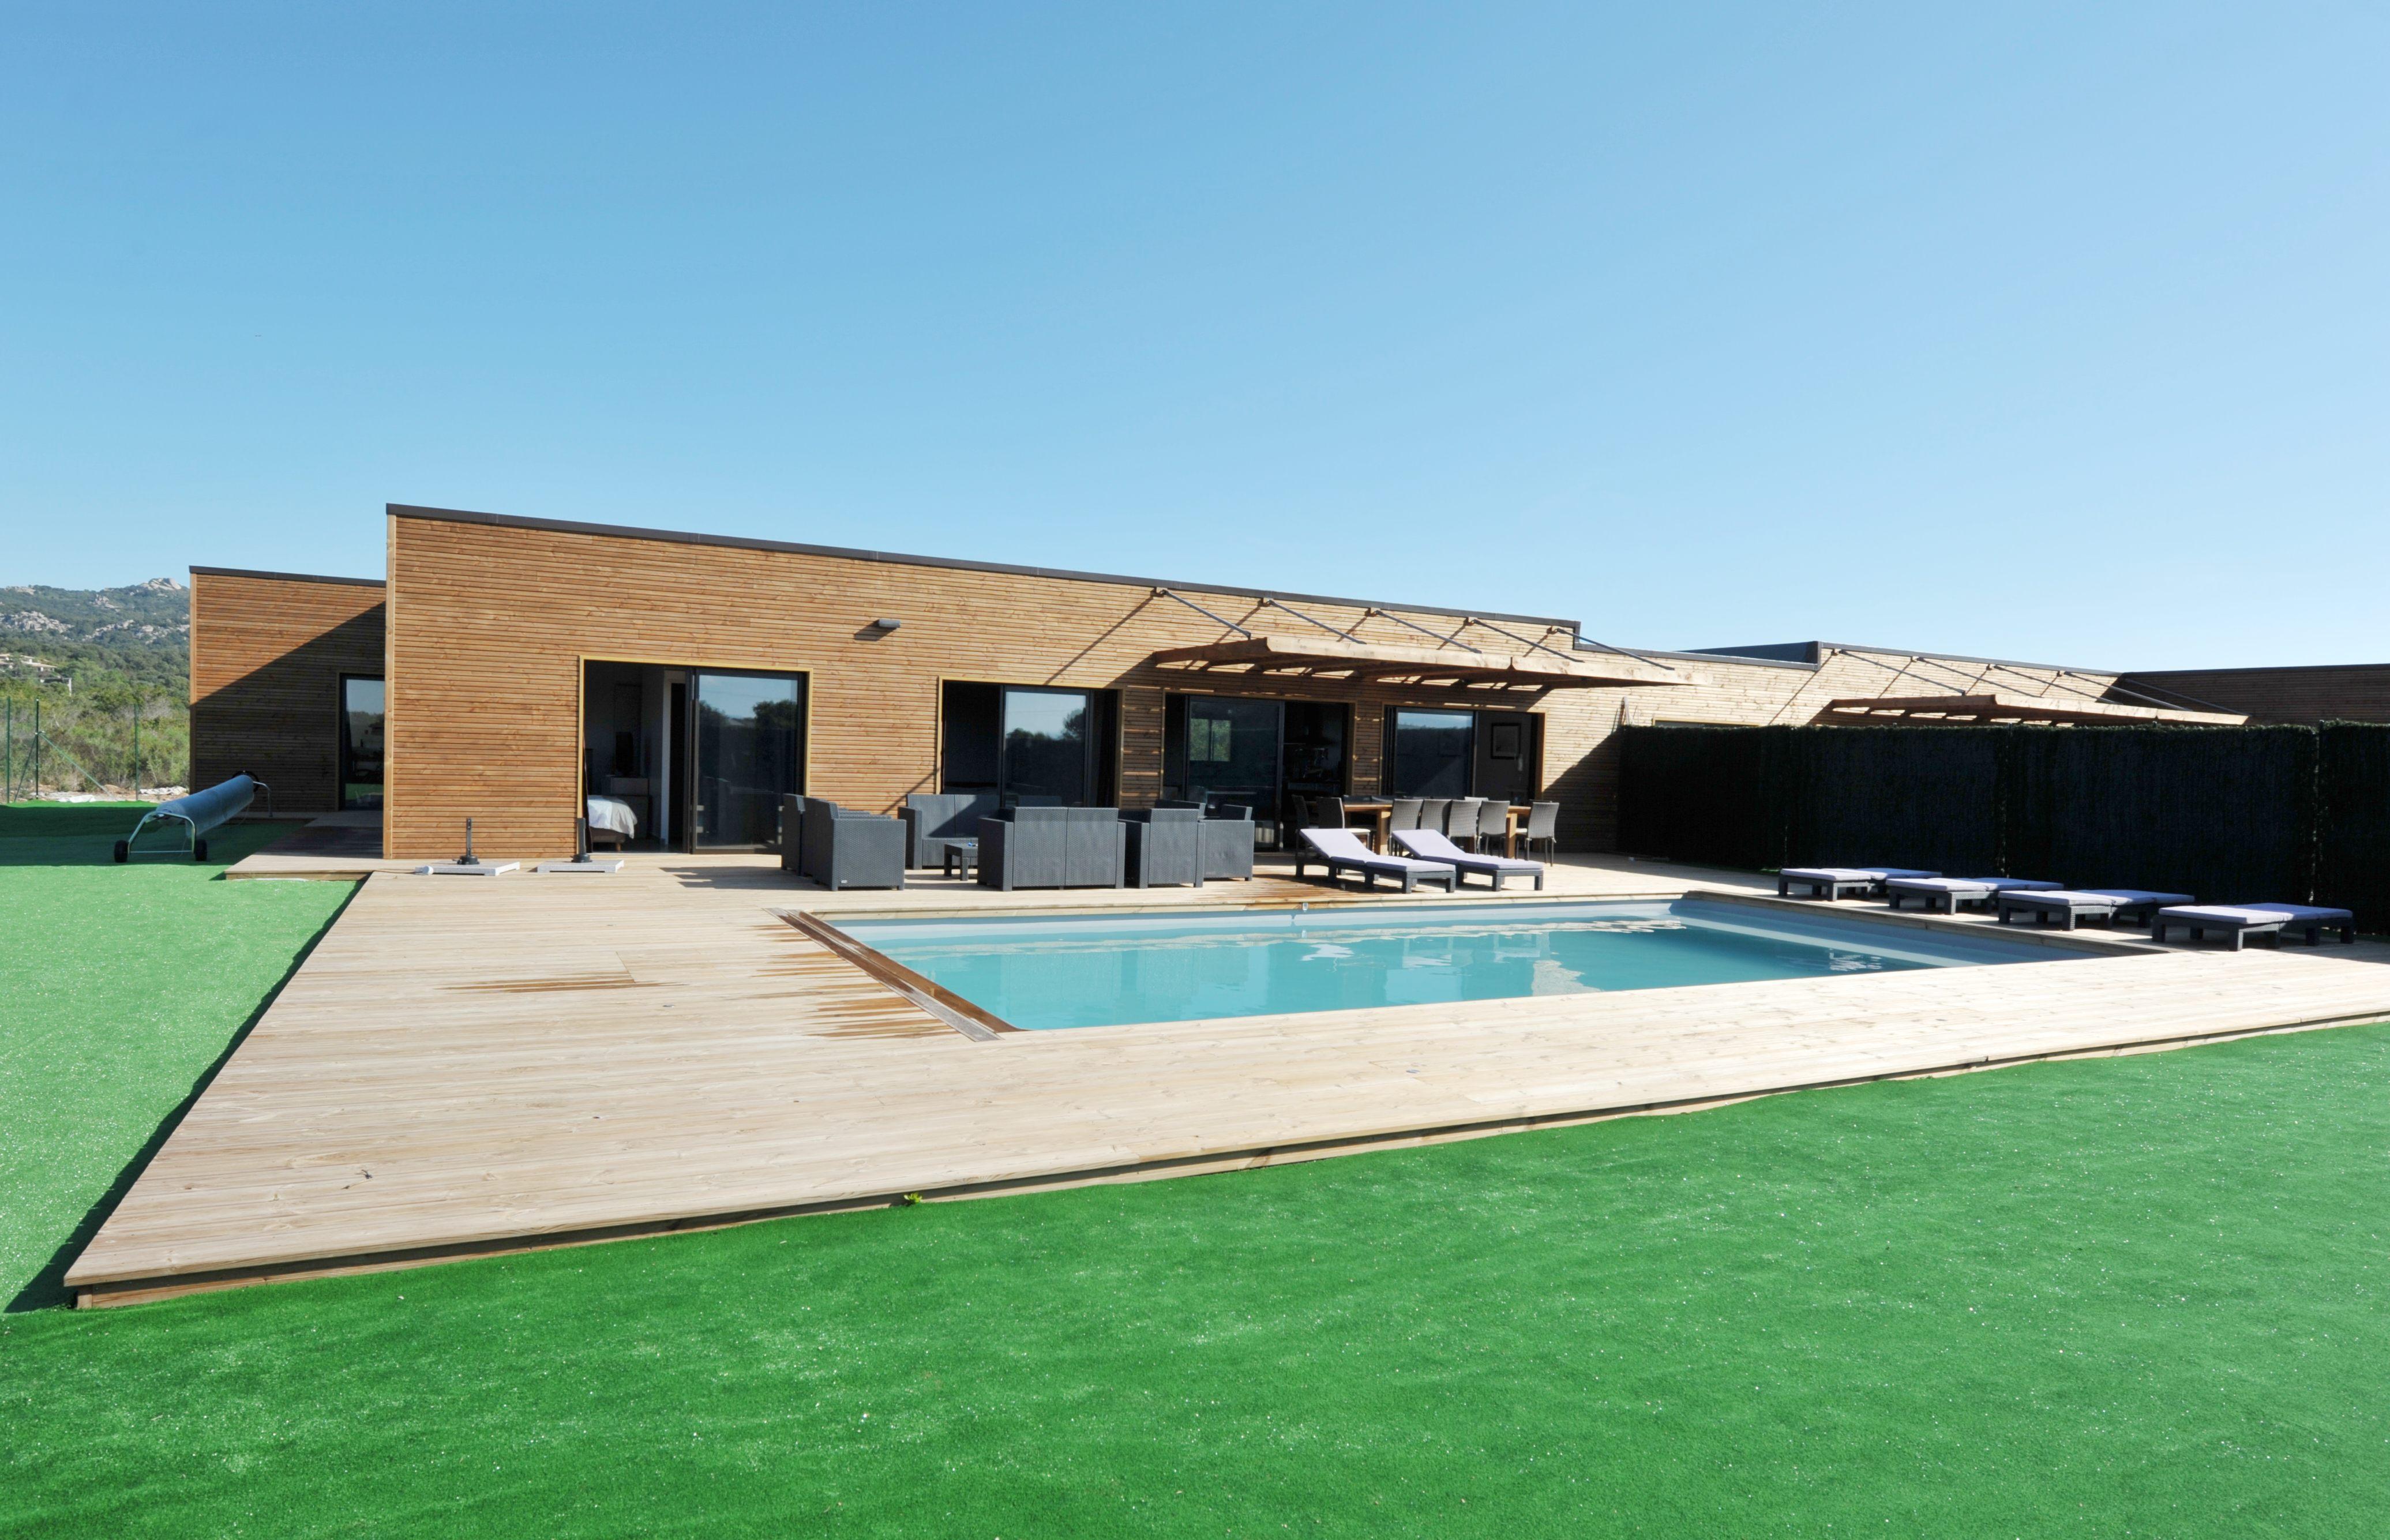 Villa contemporaine neuve type 5 avec garage et piscine for Prix piscine couverte